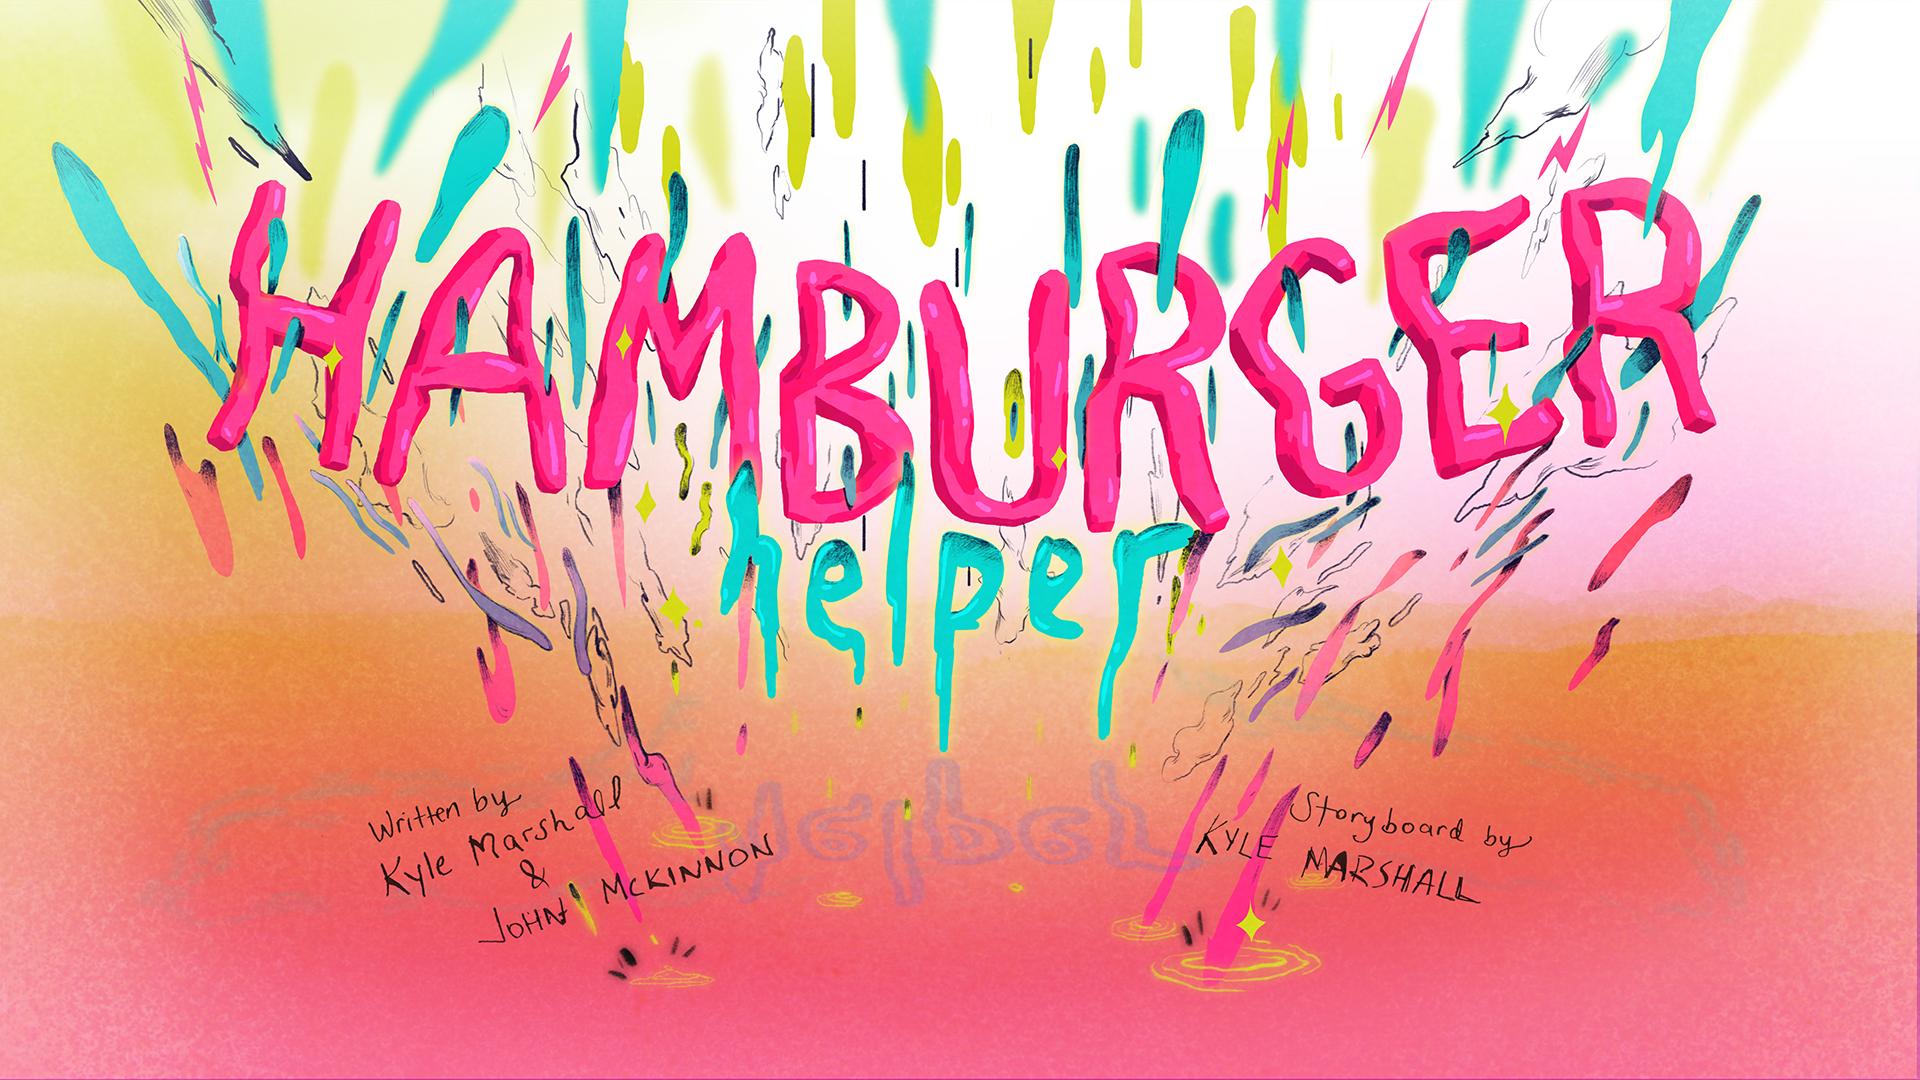 azjin_hamburger